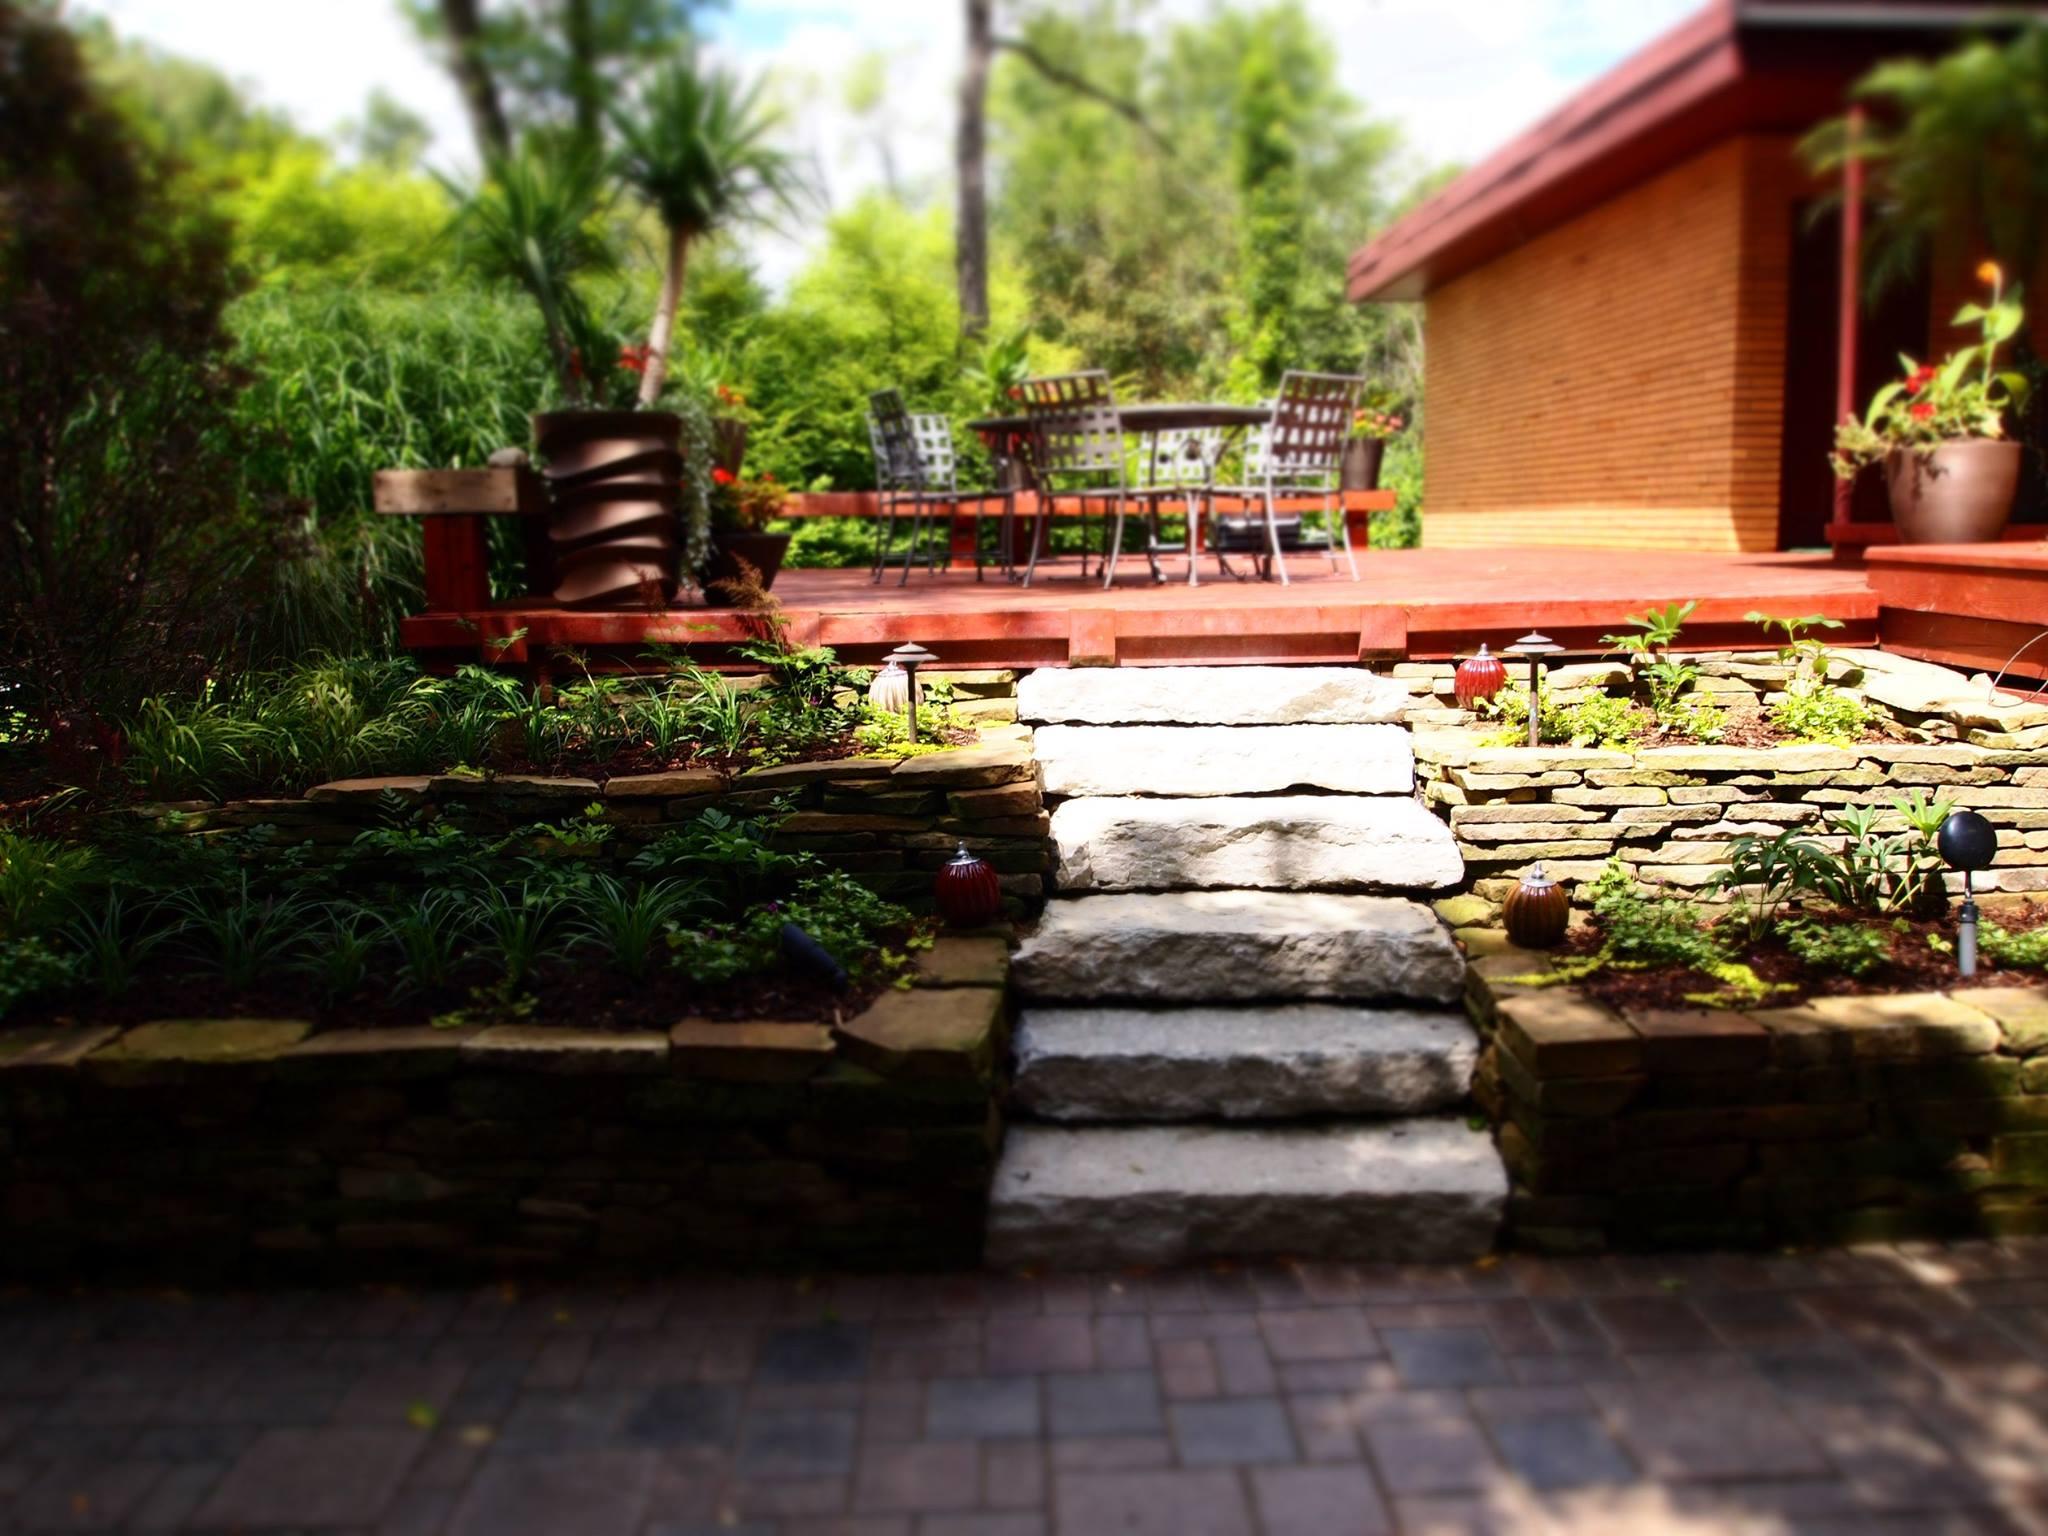 Patio Deck Design Ideas for Luxury Backyards | Backyard Mamma on Luxury Backyard Design id=37393